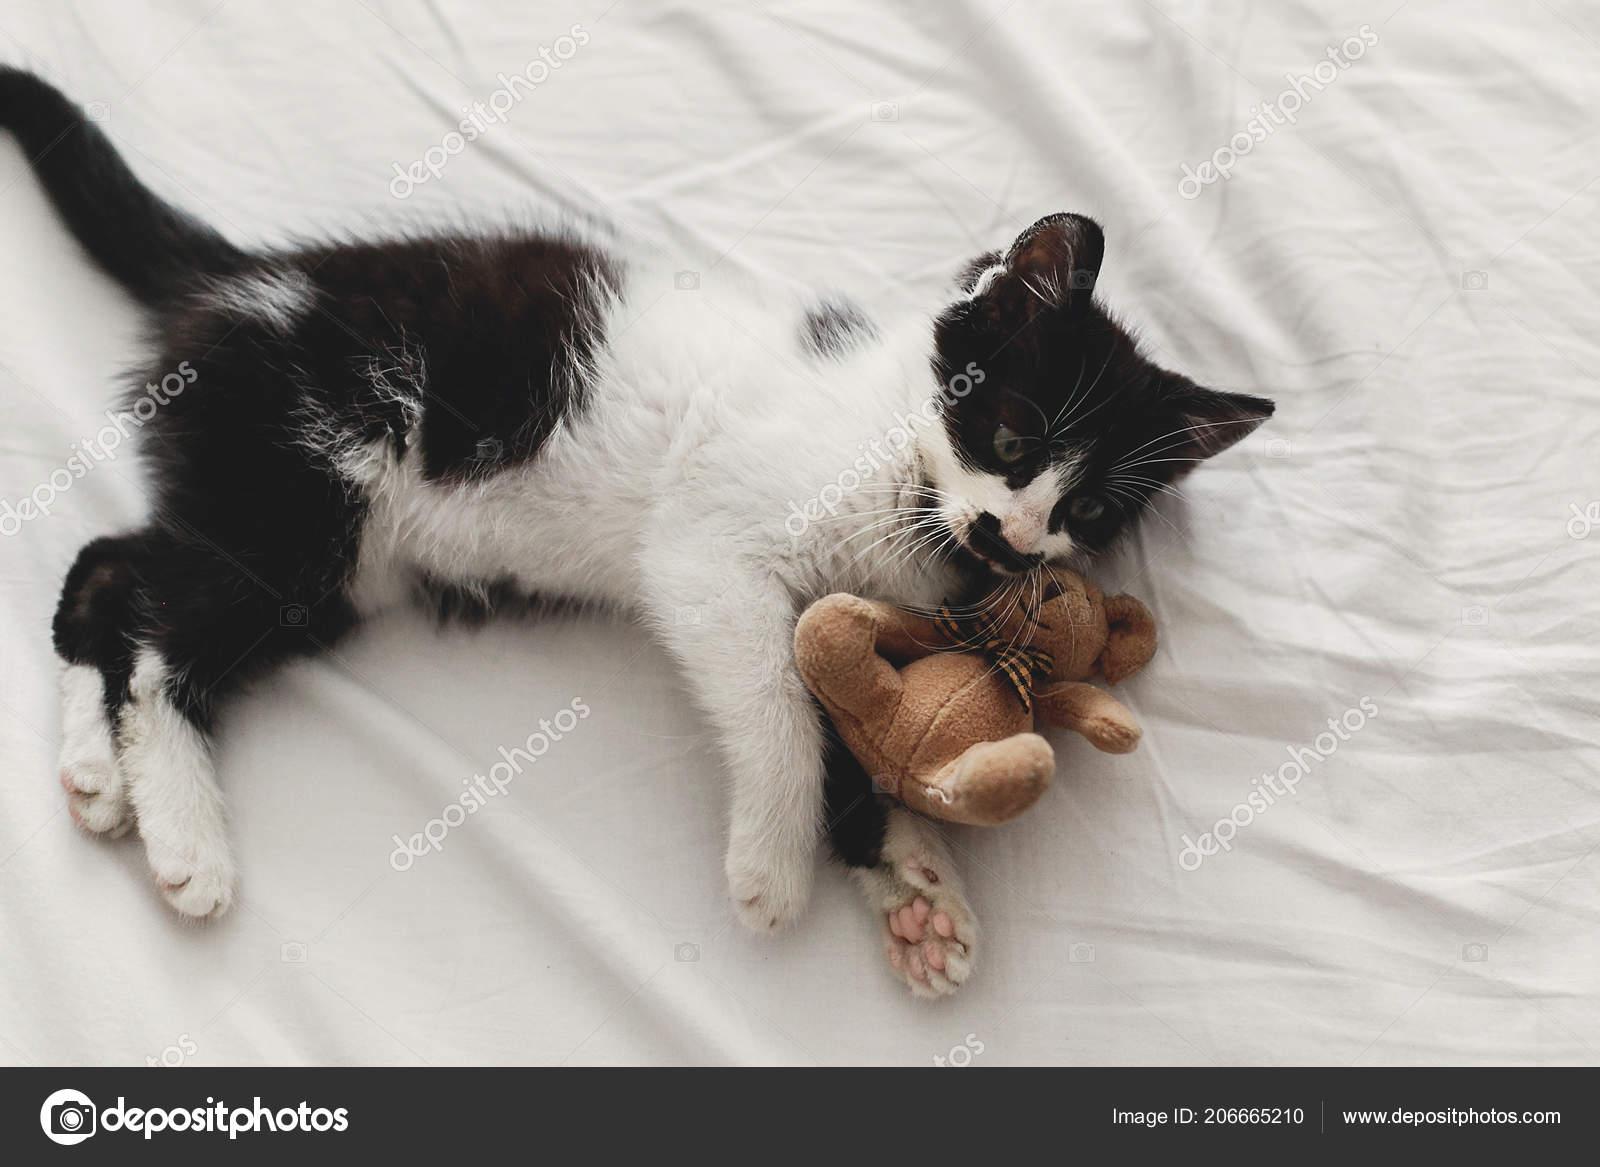 Cute Little Kitten Playing Little Teddy Bear Toy White Bed Stock